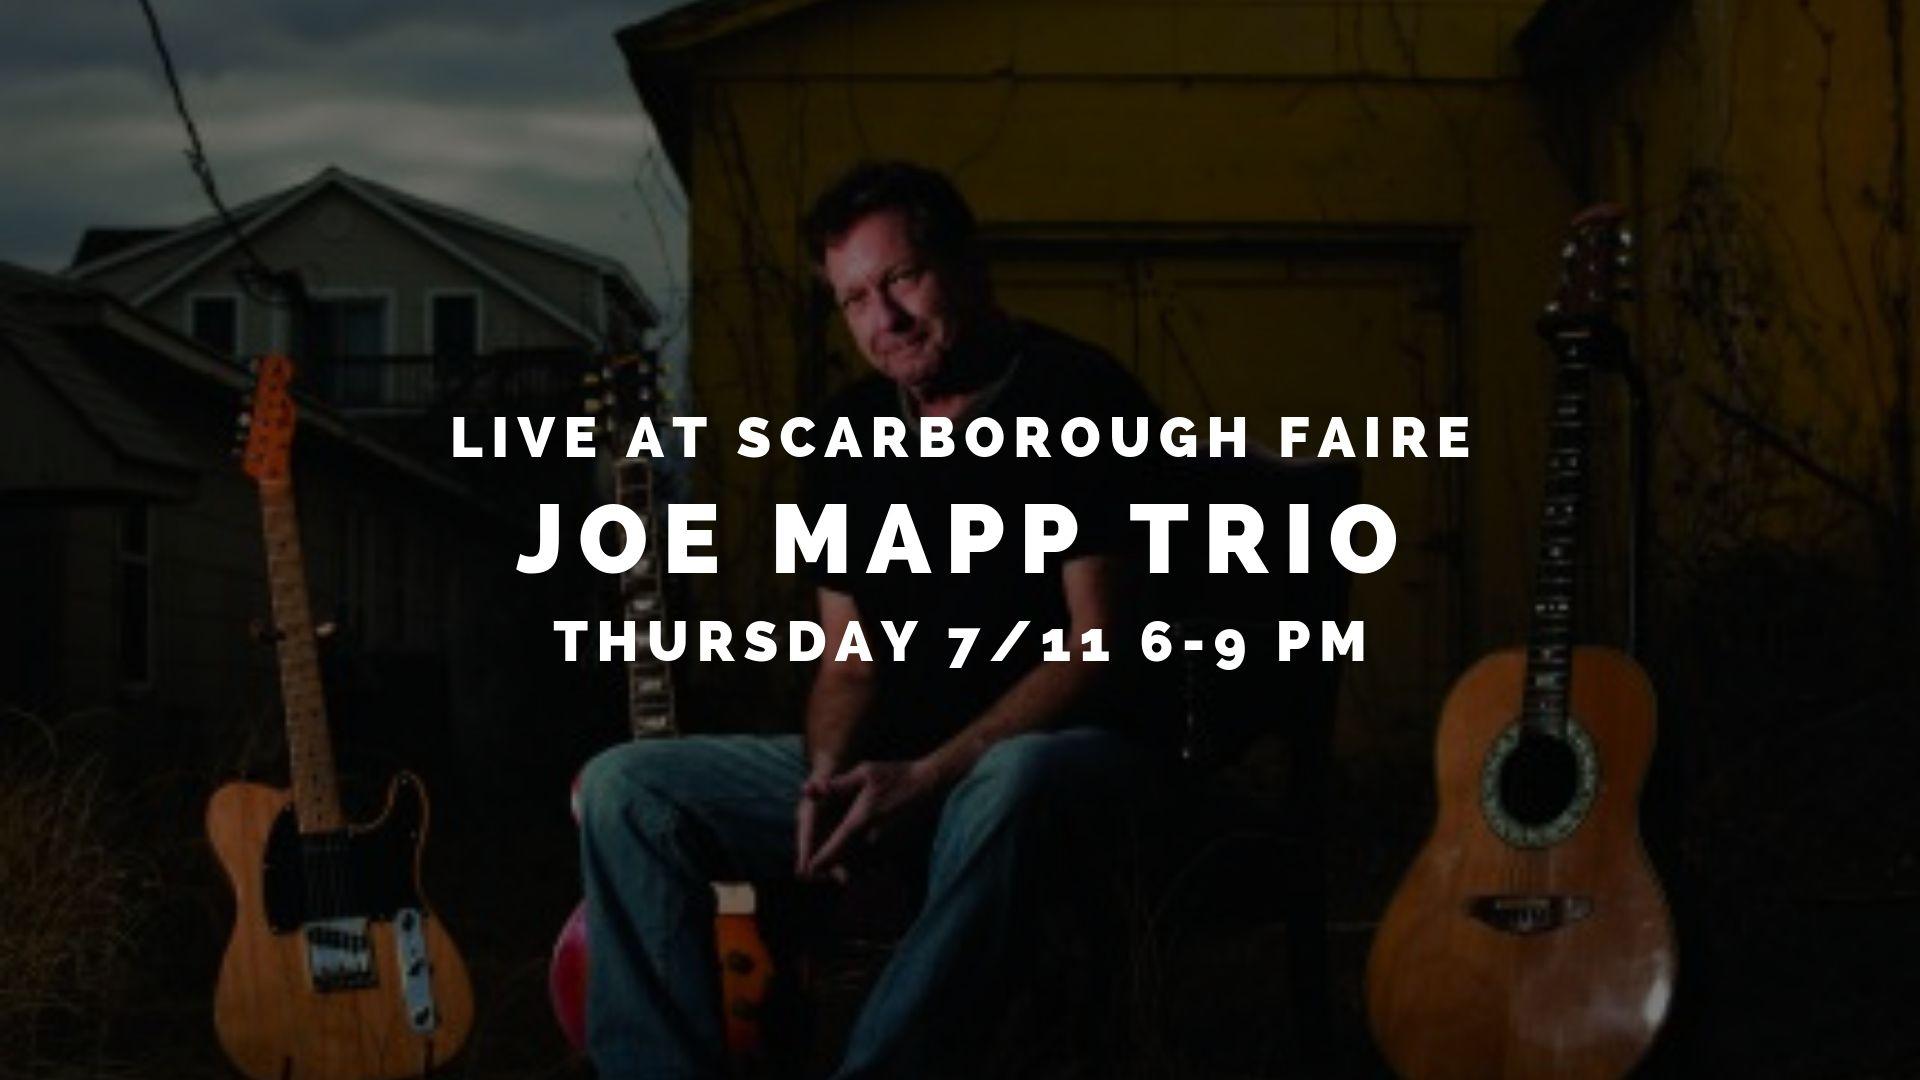 Joe-Mapp-Trio-Live-at-Scarborough